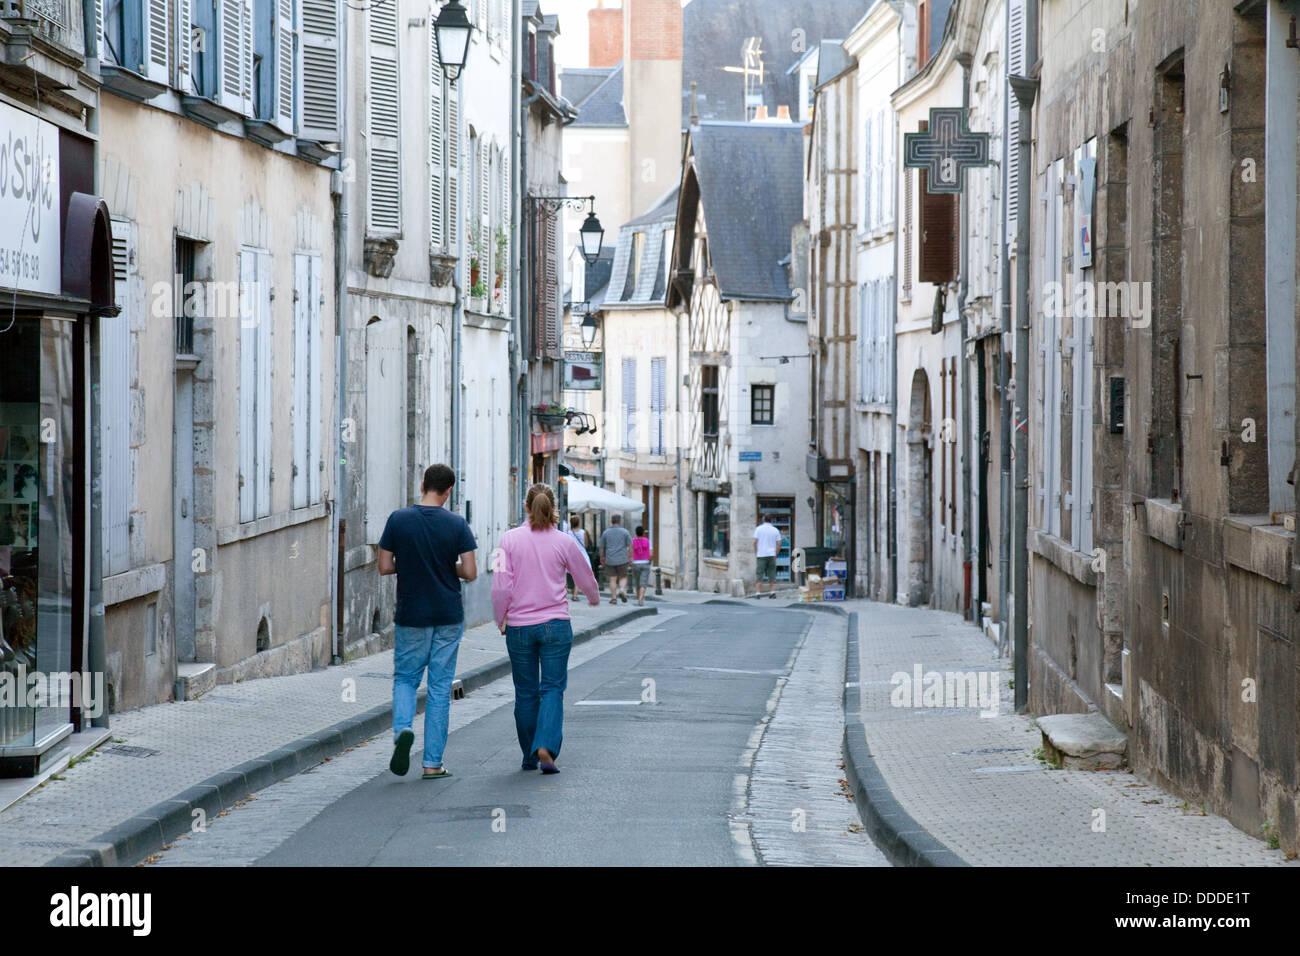 Street scene, in the French town of Blois, Loir-et-Cher, Loire Vally, France Europe - Stock Image